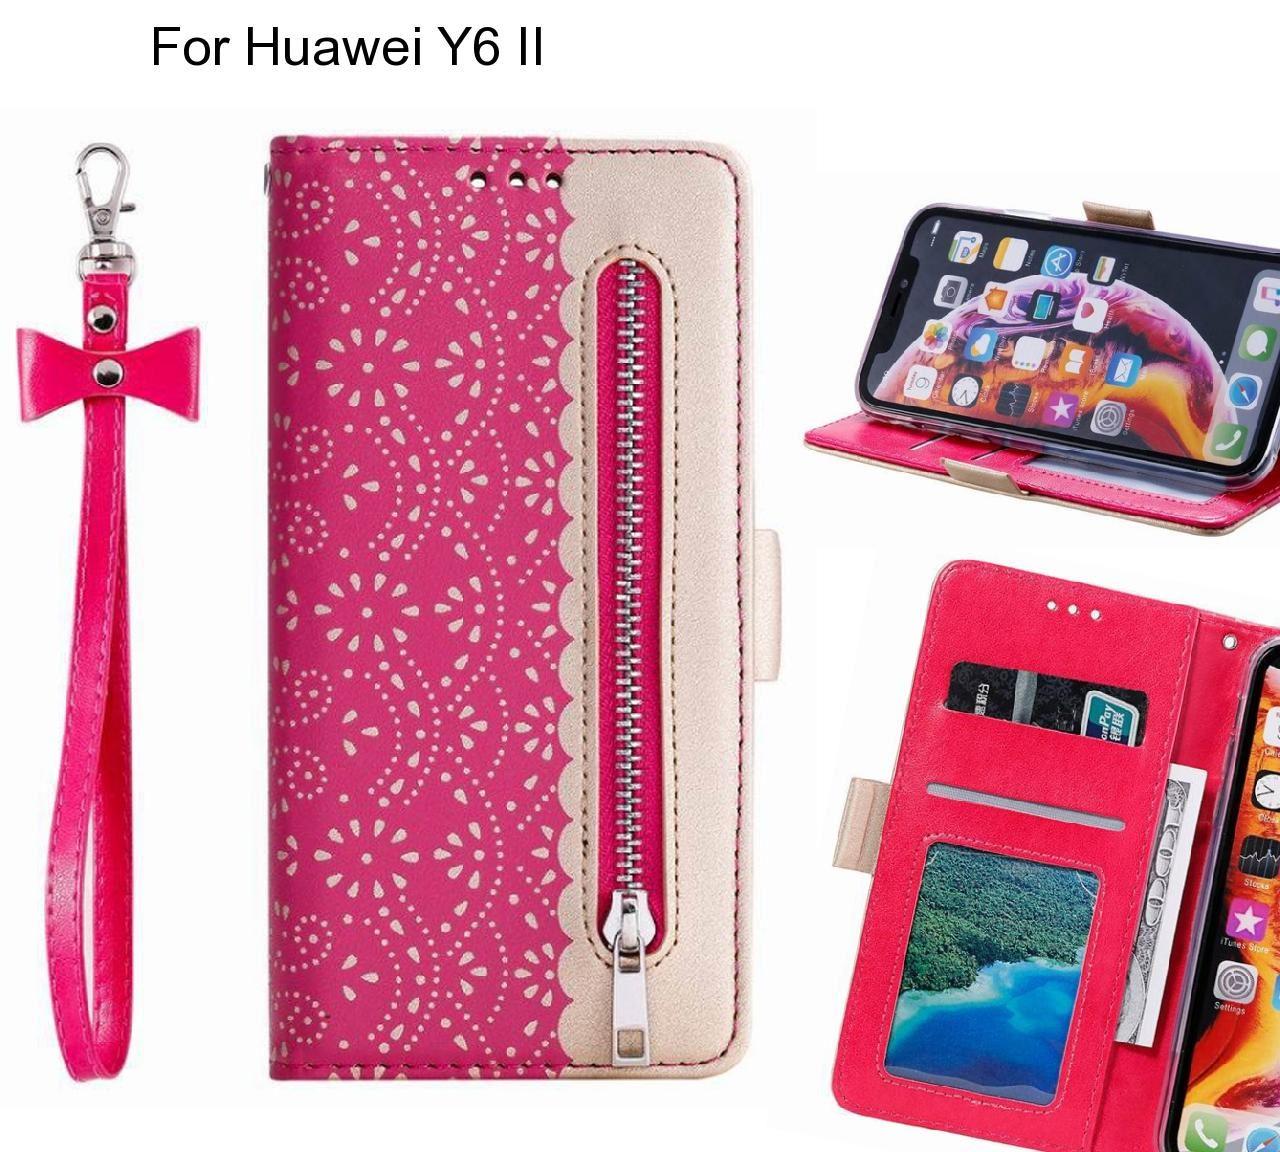 Huawei Y6 II Case multifunctional Wallet Case